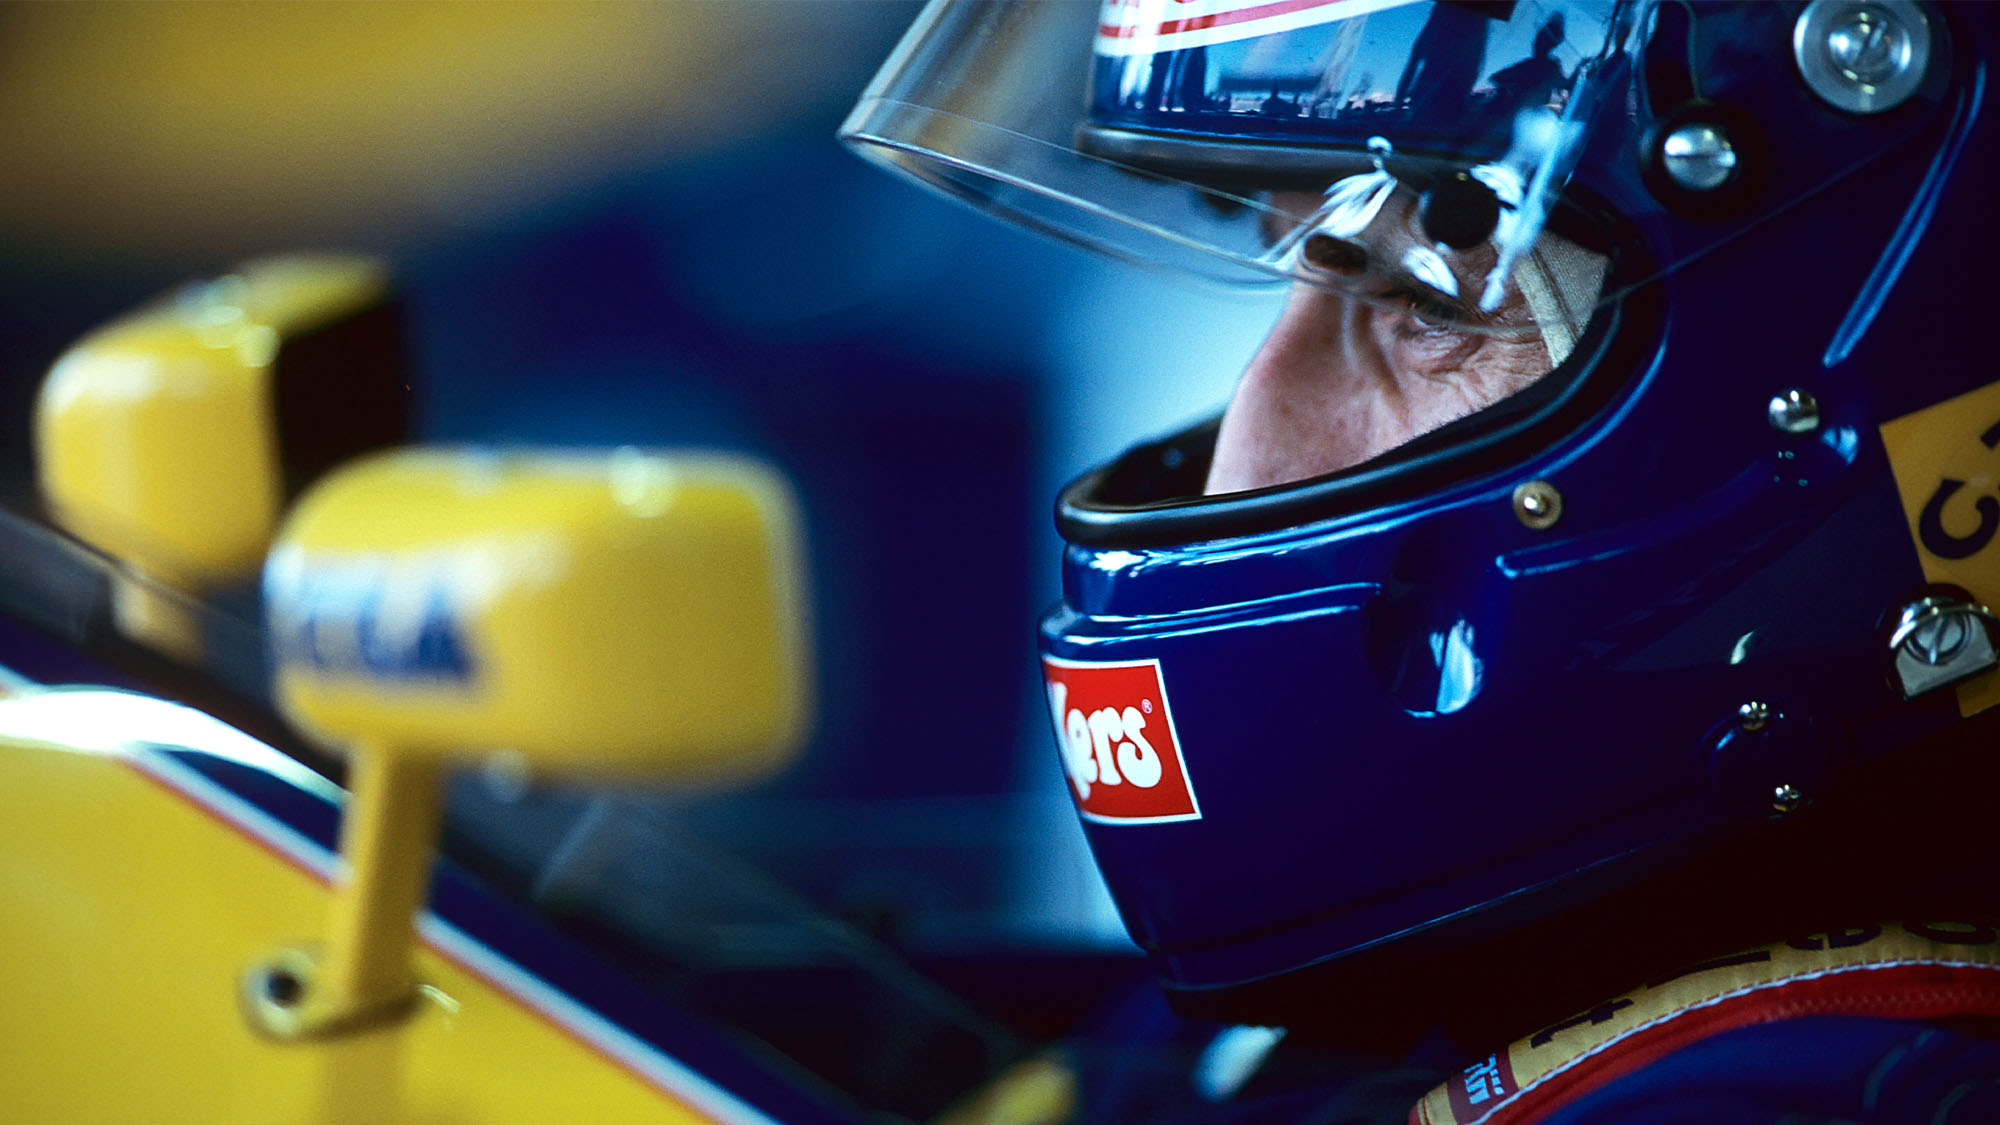 Alain Prost, Williams-Renault FW15C, Grand Prix of Brazil, Autodromo Jose Carlos Pace, March 28, 1993. (Photo by Paul-Henri Cahier/Getty Images)